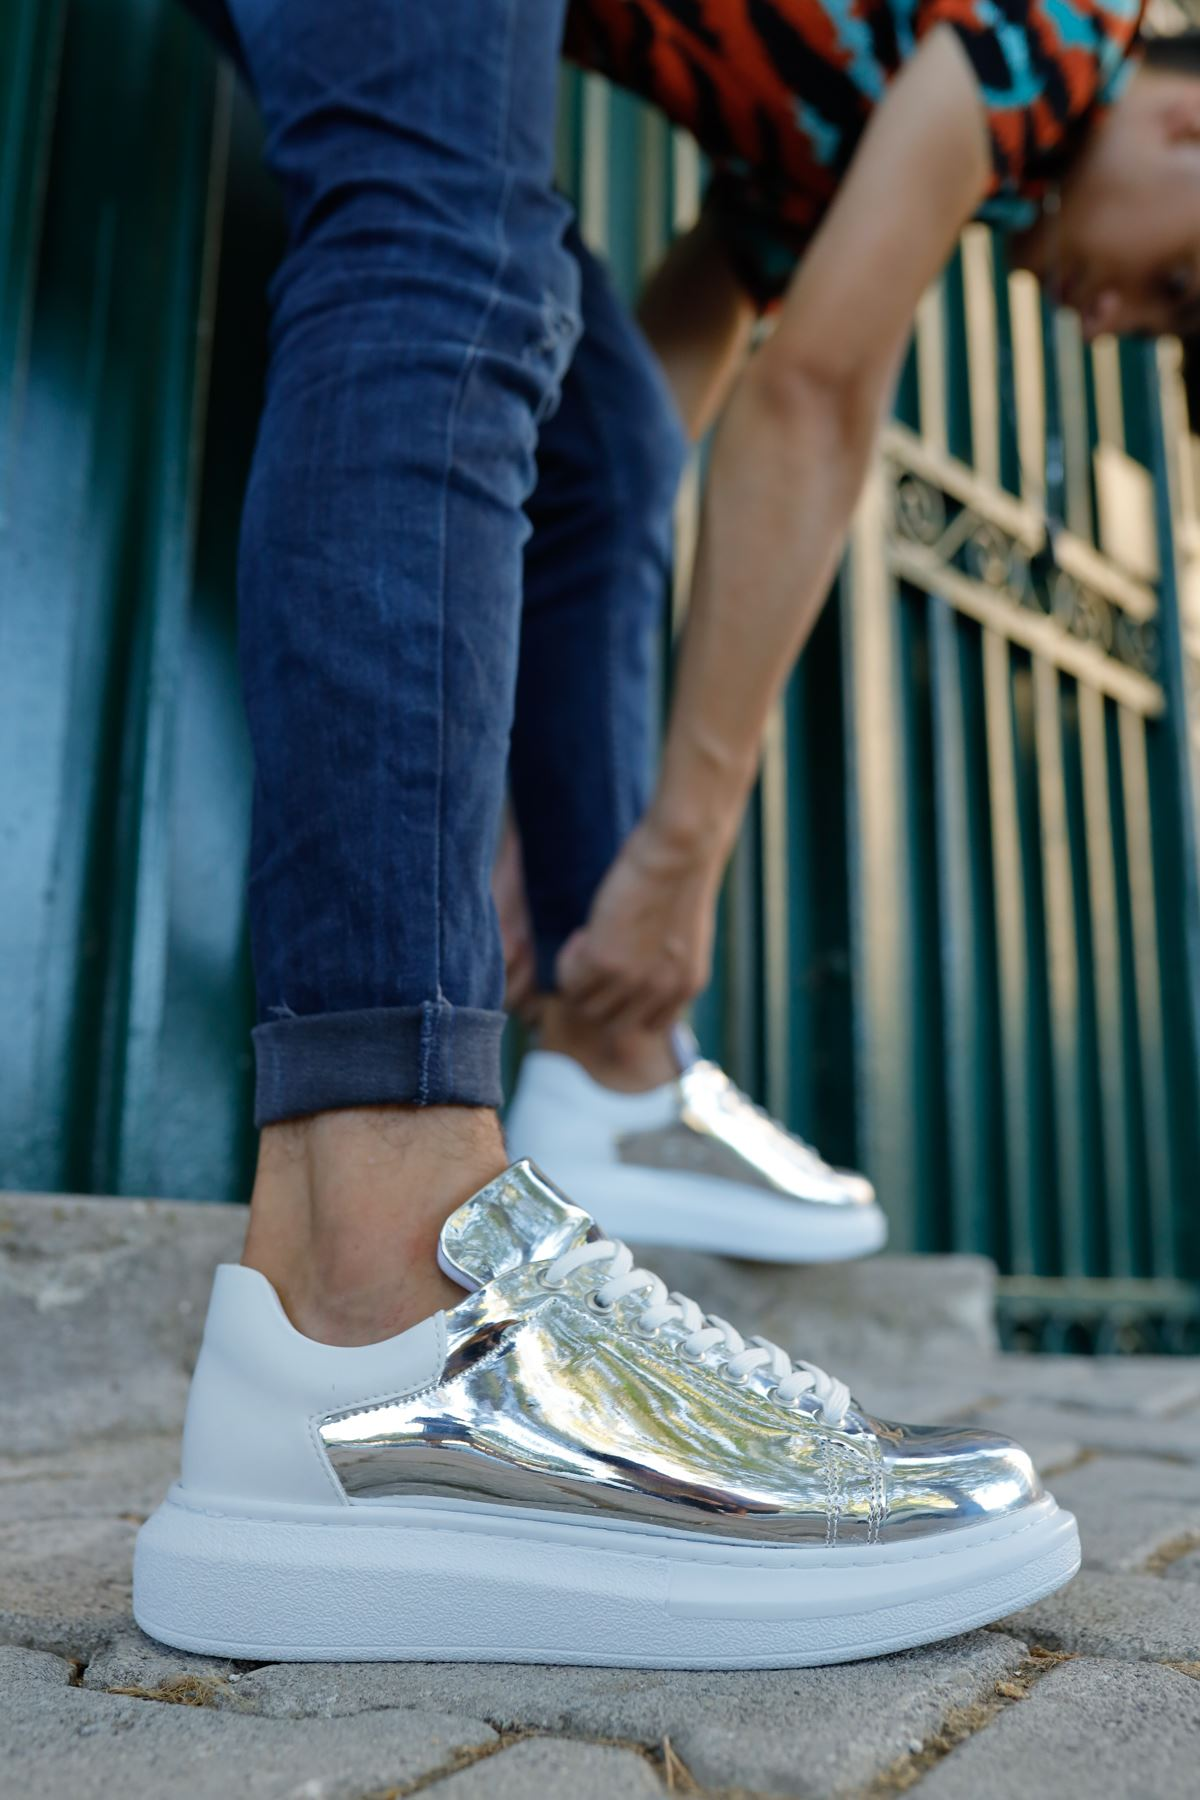 Chekich CH259 BT Erkek Ayakkabı GUMUS/BEYAZ